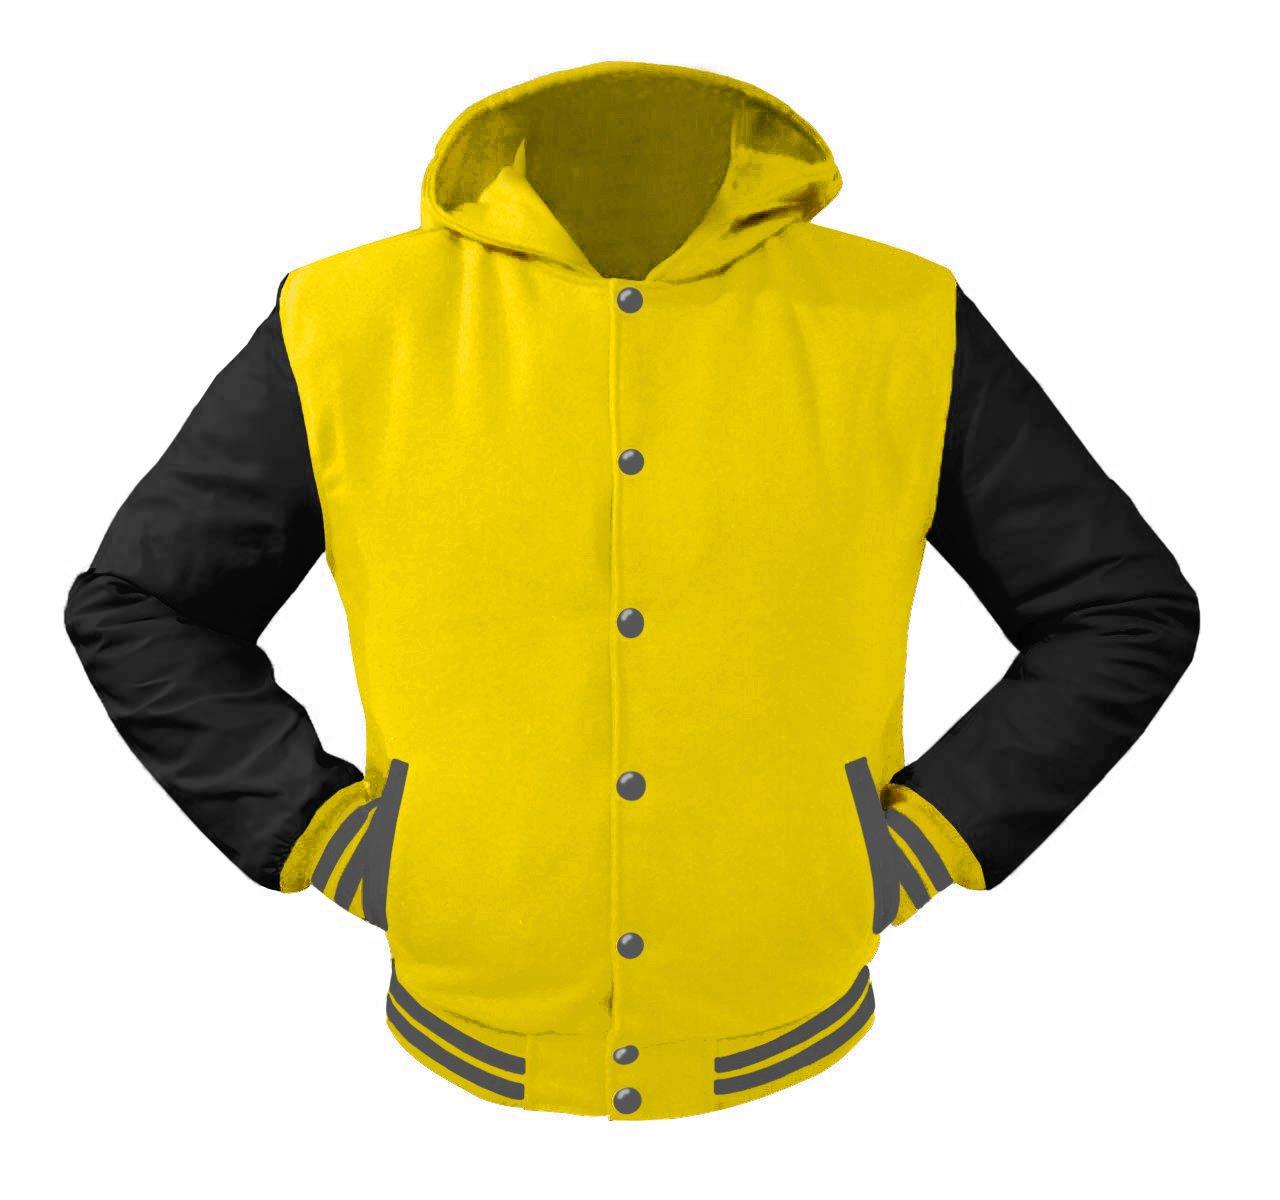 luvsecretlingerie Superb Leather Sleeve Original American Varsity Letterman College Baseball Kid Wool Hoodie Jackets #B-G-G